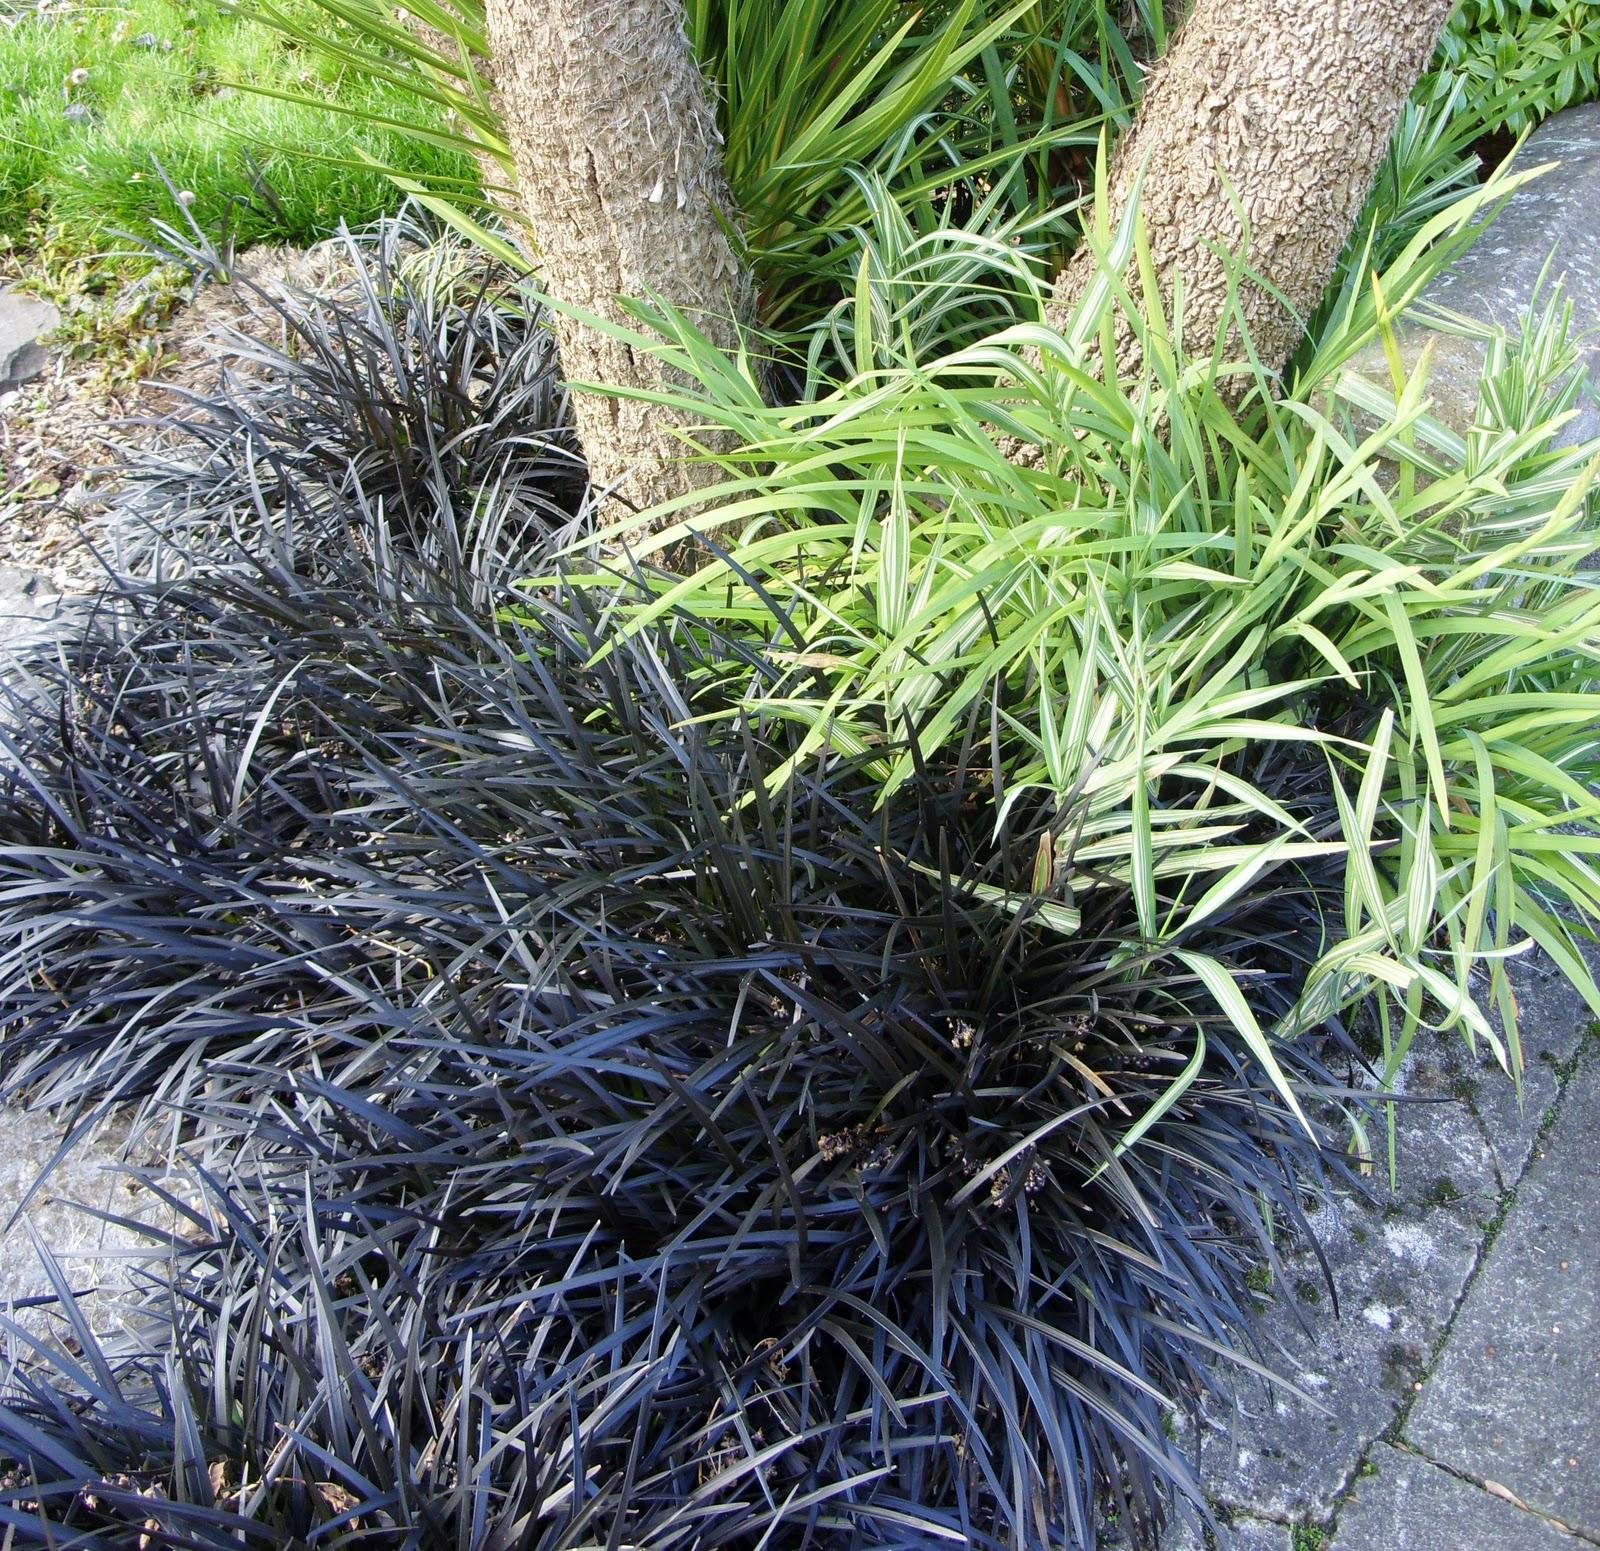 Kellis Northern Ireland Garden Winter Grasses .